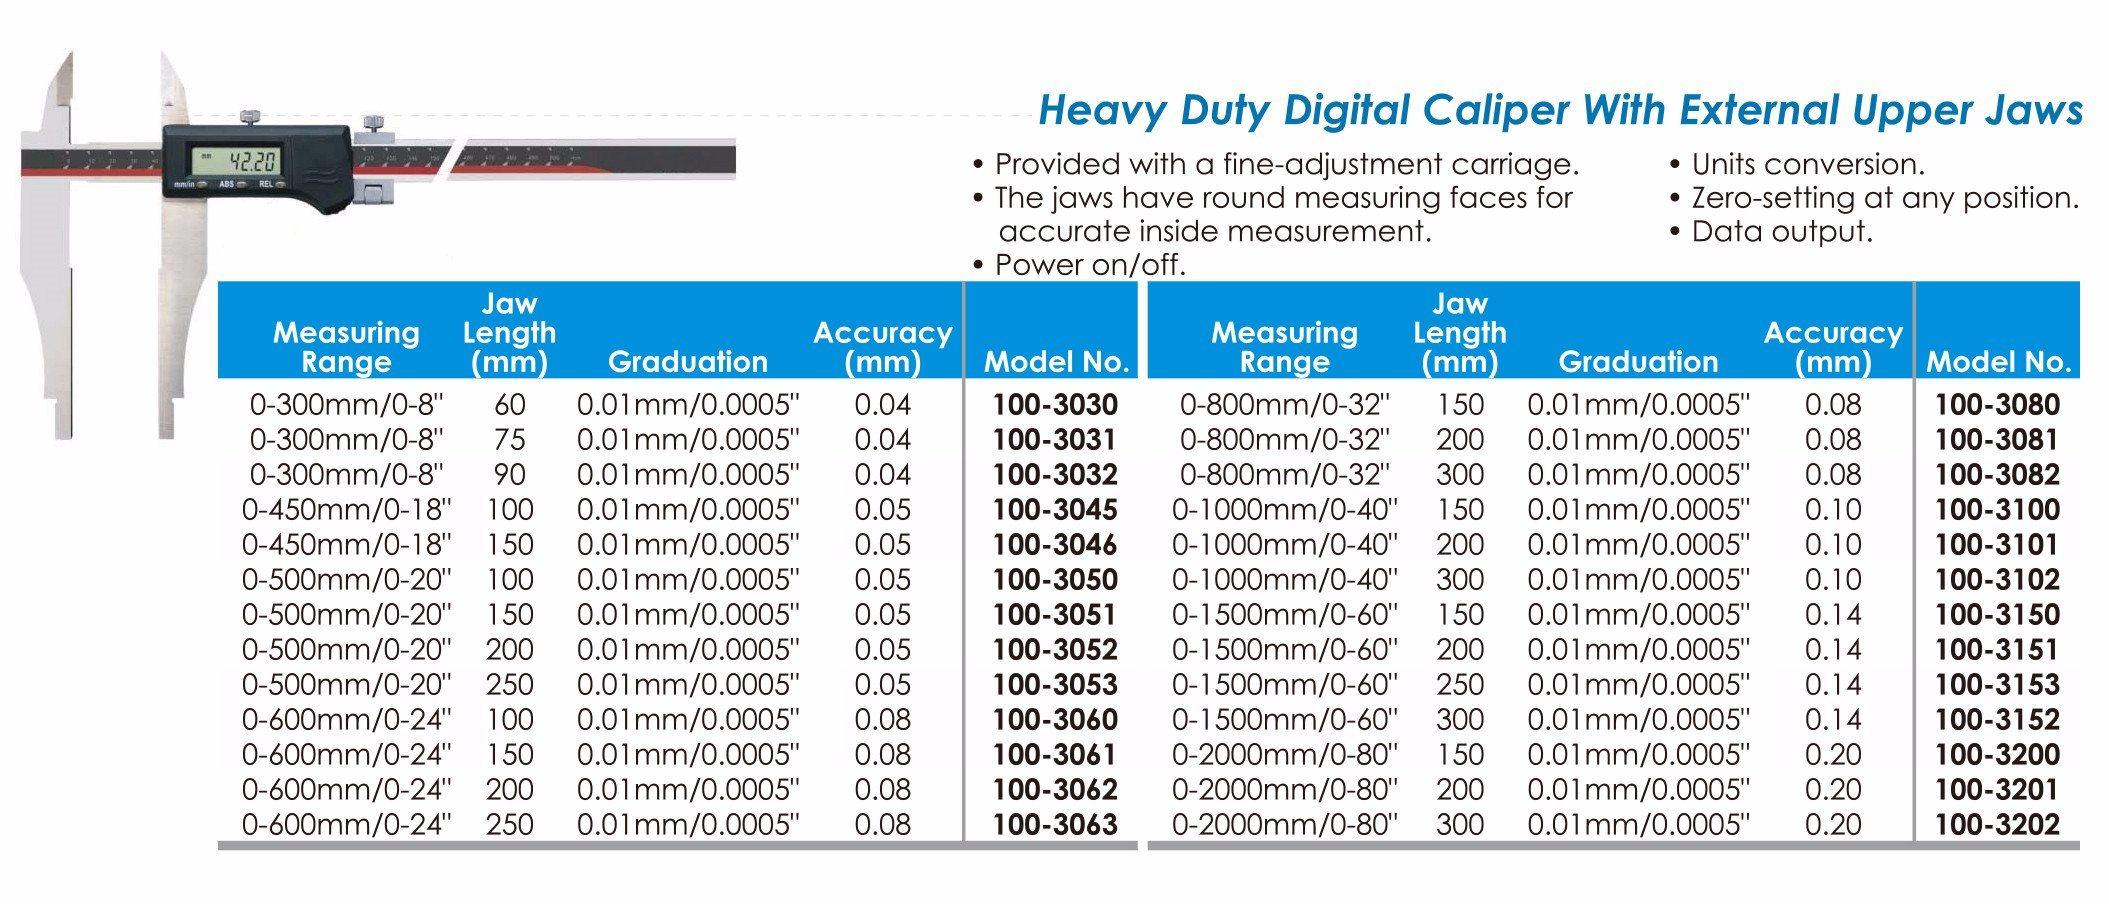 Heavy Duty Digital Caliper with External Upper Jaws